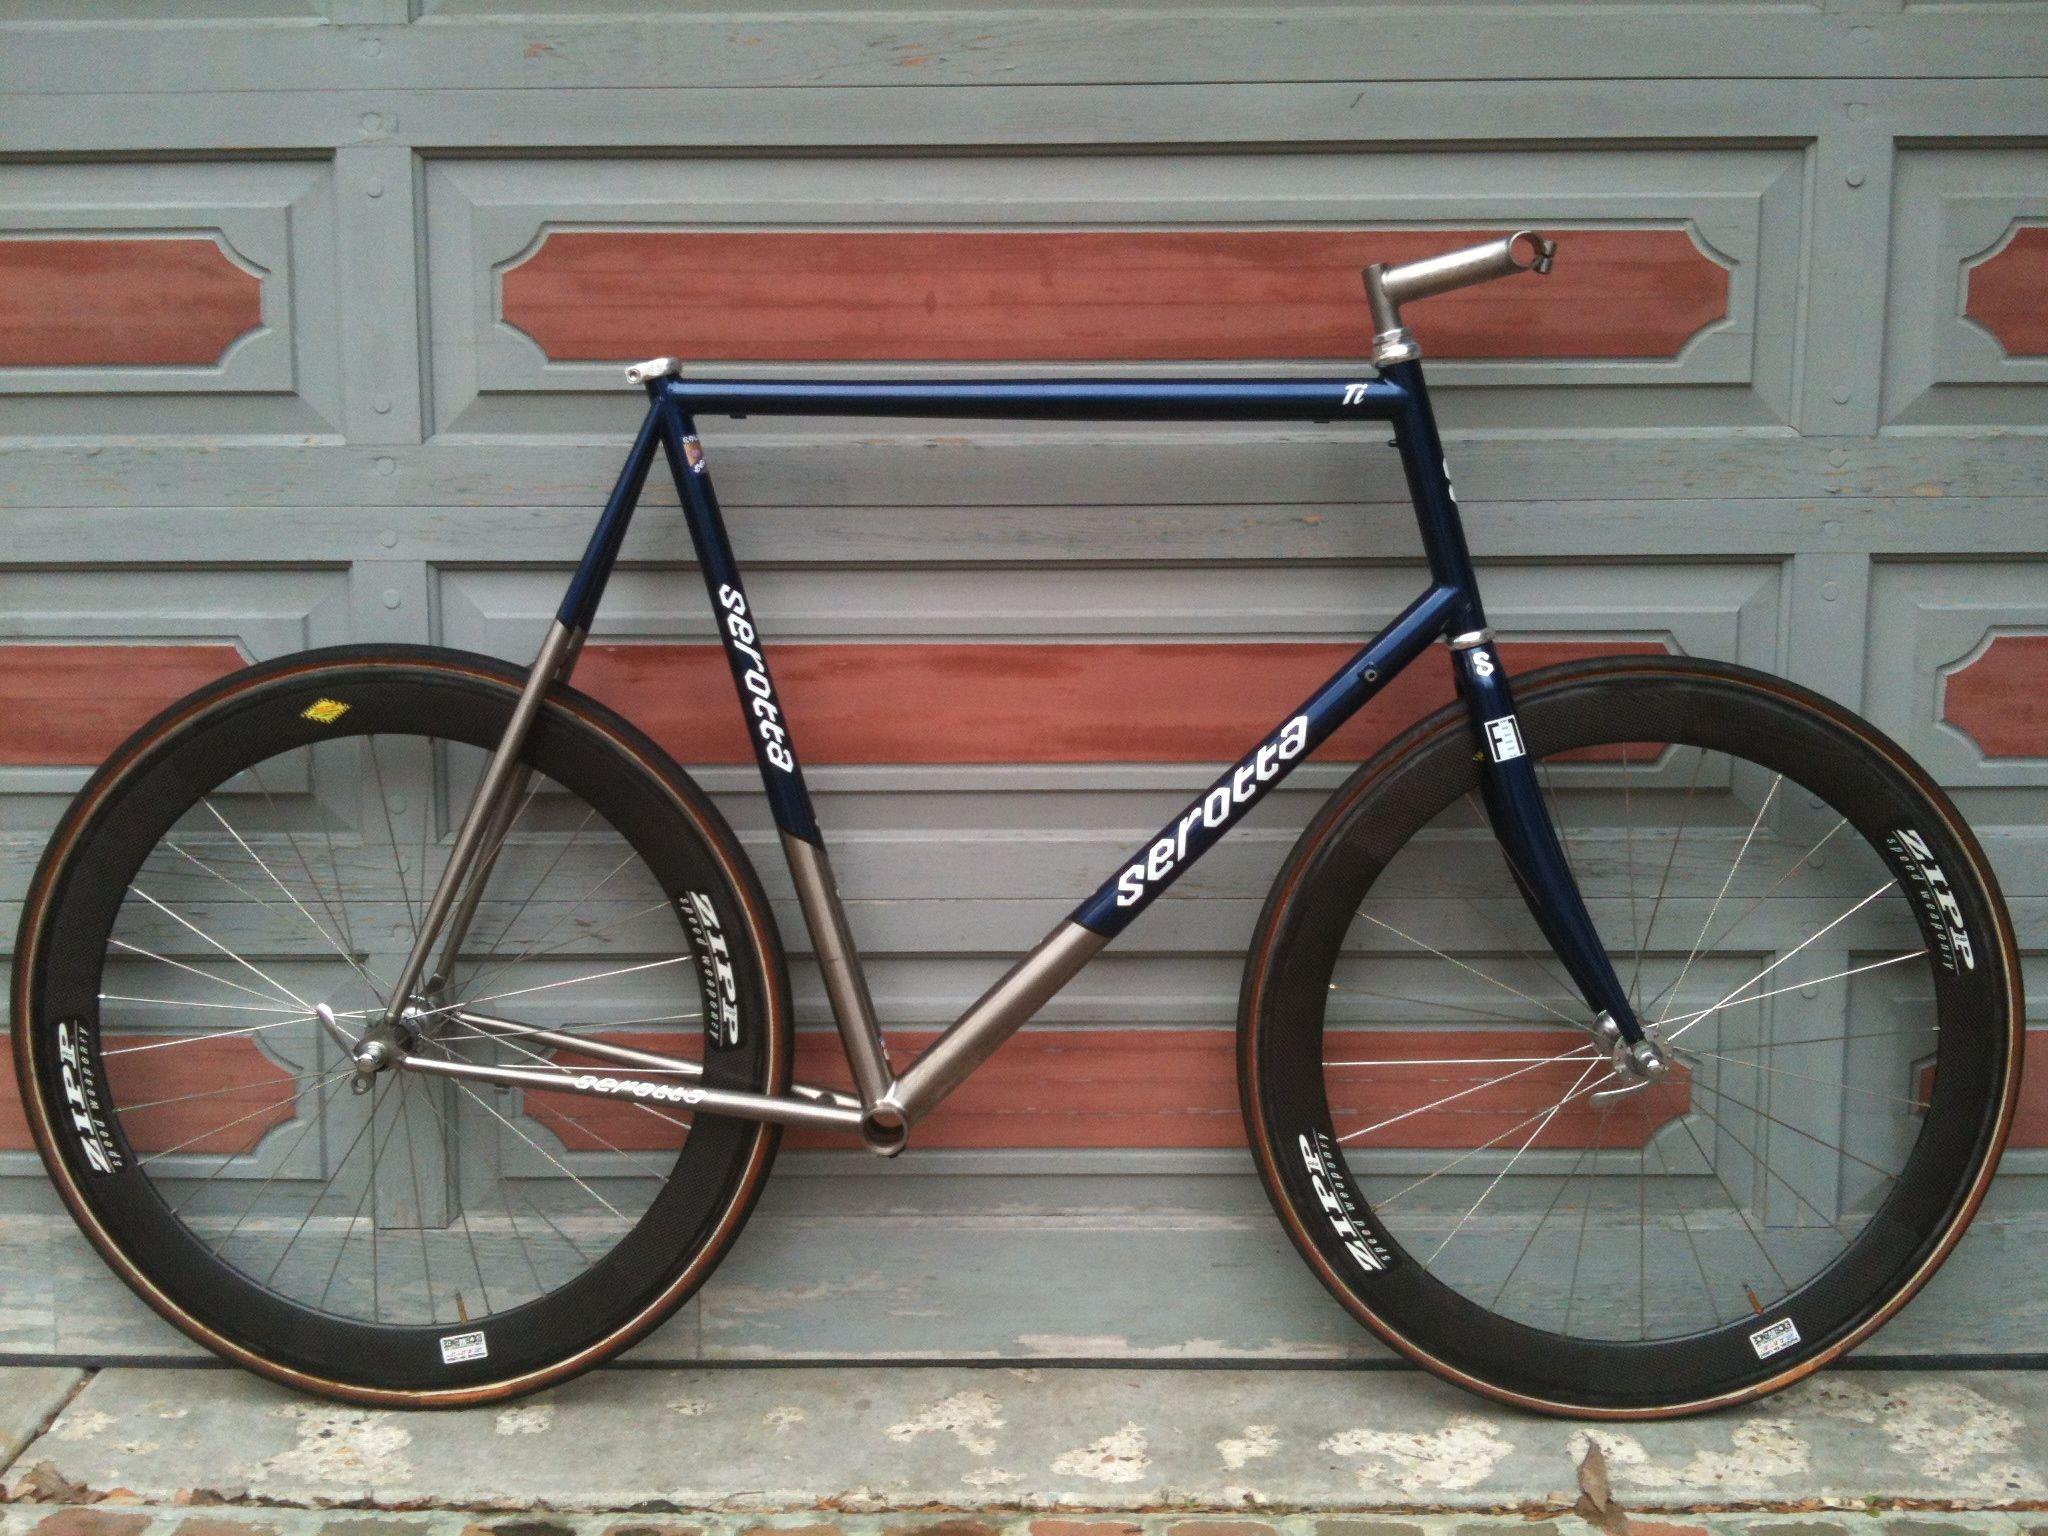 1996 64cm Ti Colorado Concept Serotta The Paceline Forum Bike Bike Photo Road Bicycle